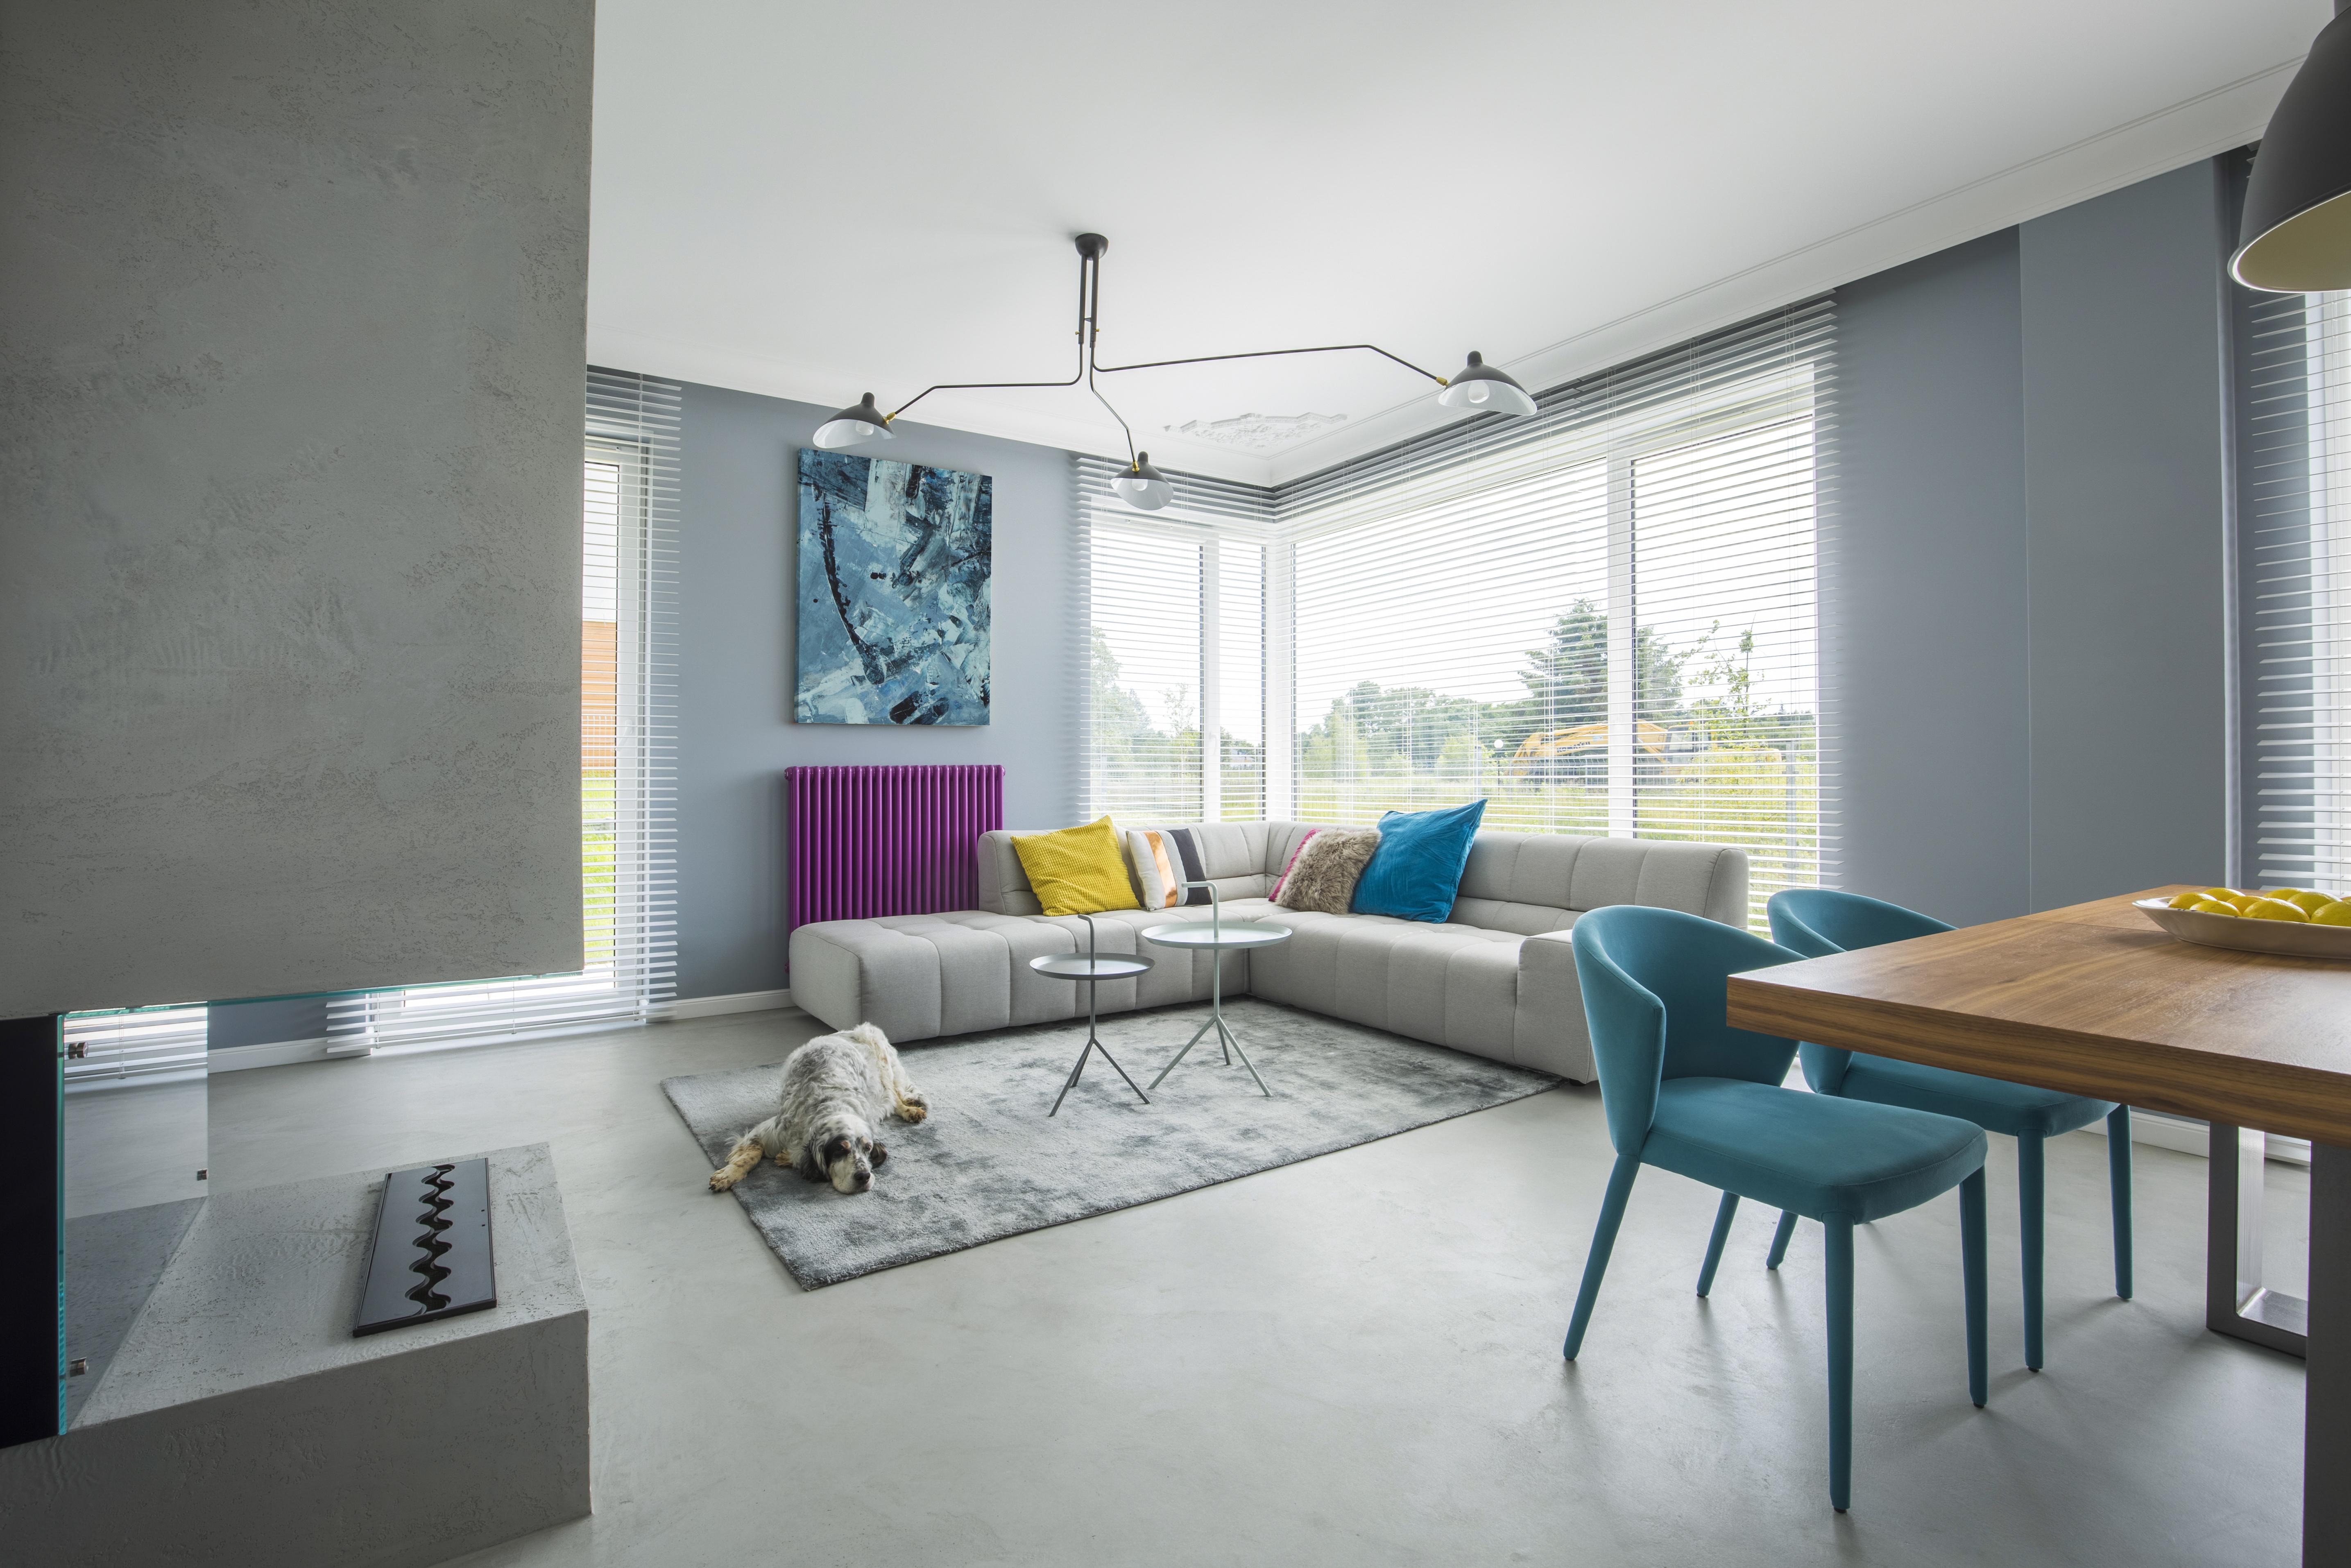 Gray open space interior